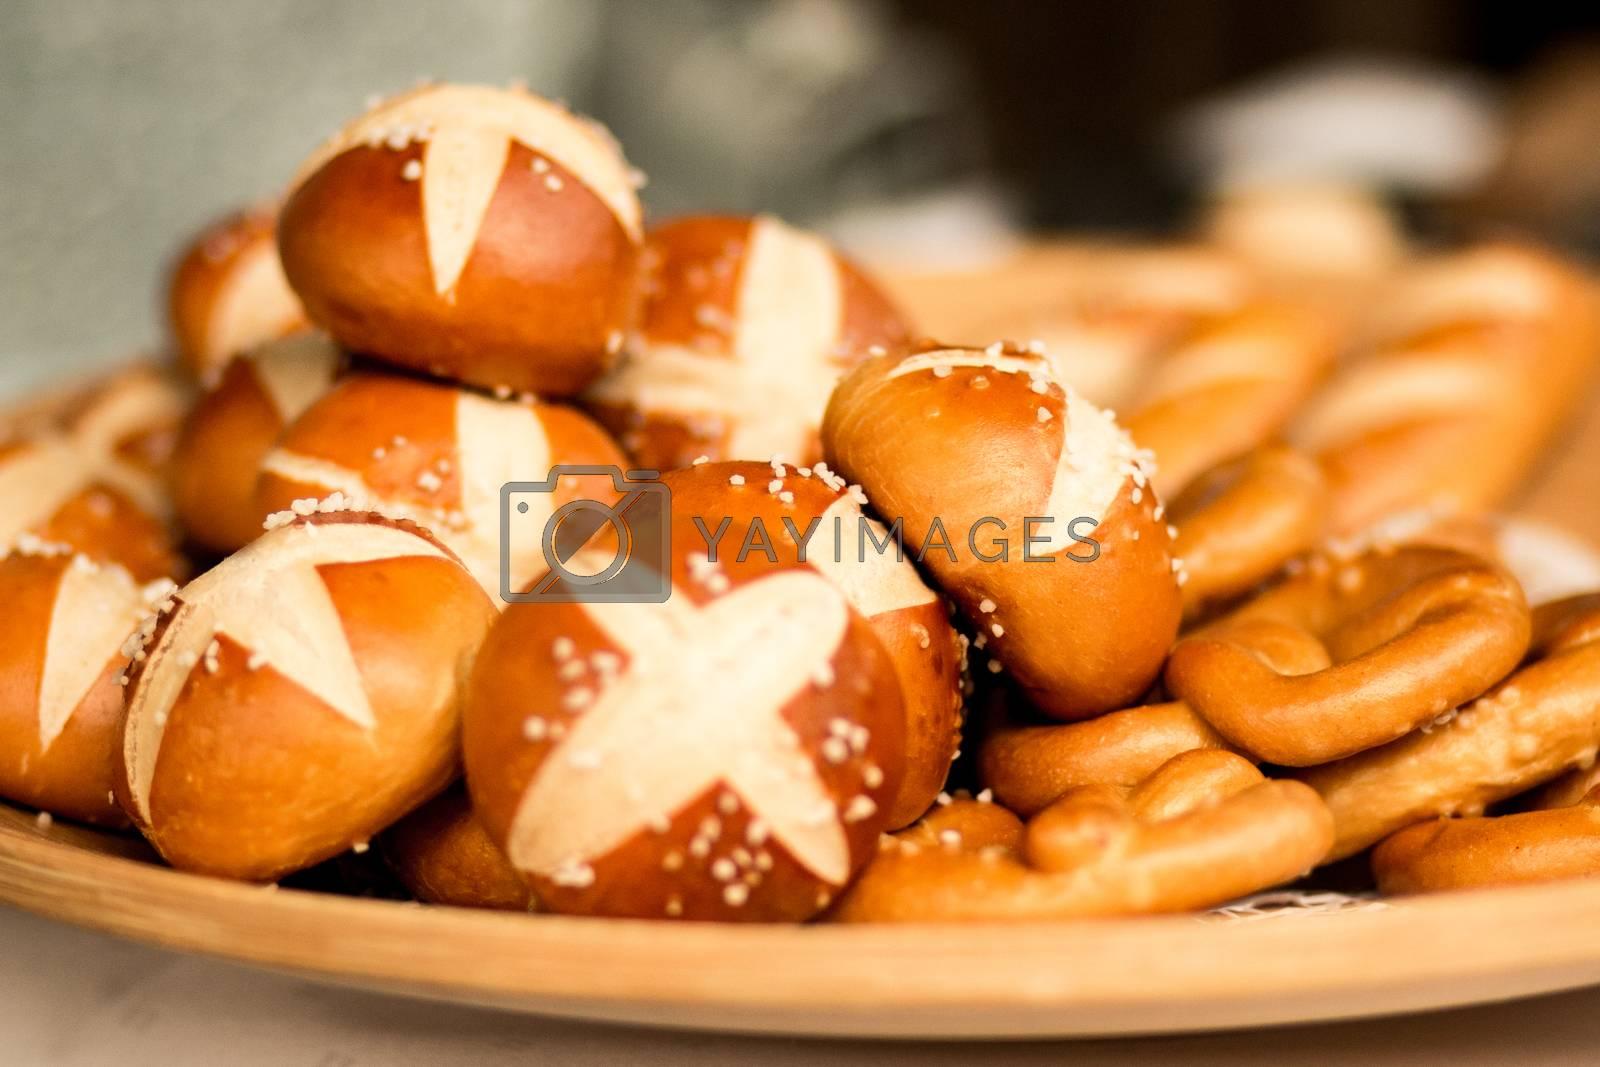 bun roll pretzel salty food bakery basket german breakfast . High quality photo